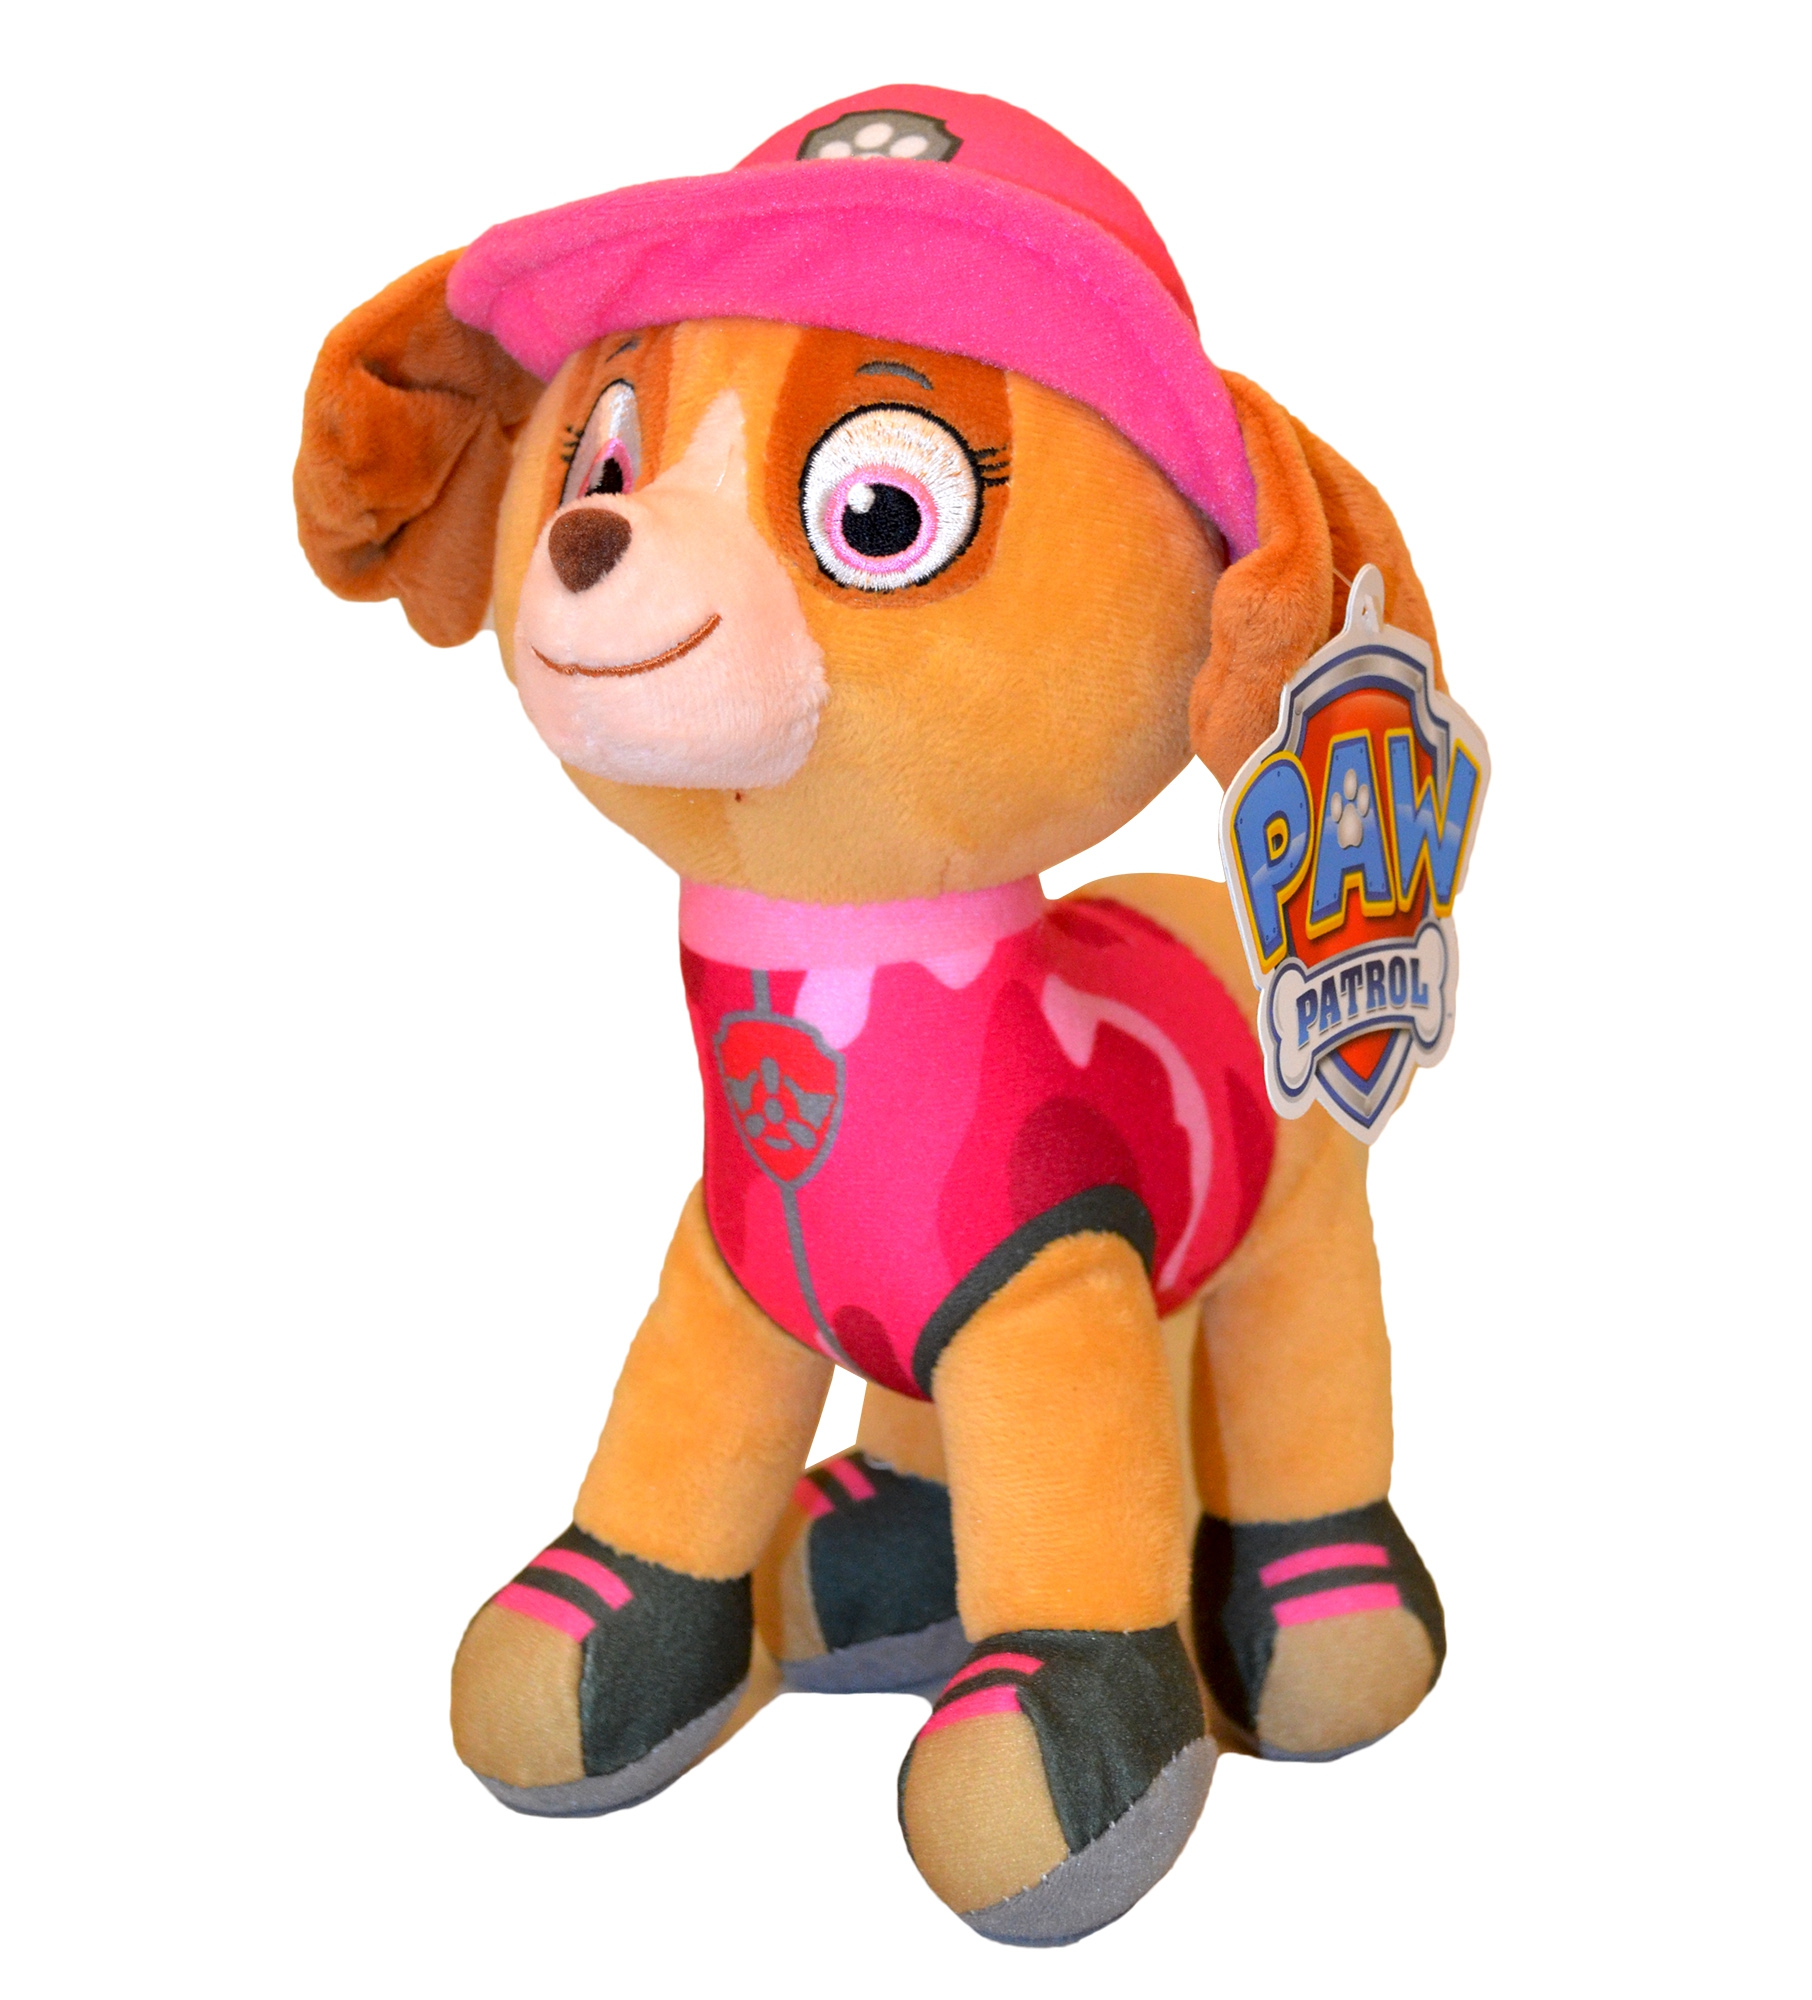 Paw Patrol Jungle Rescue 'Skye' 27cm Plush Soft Toy